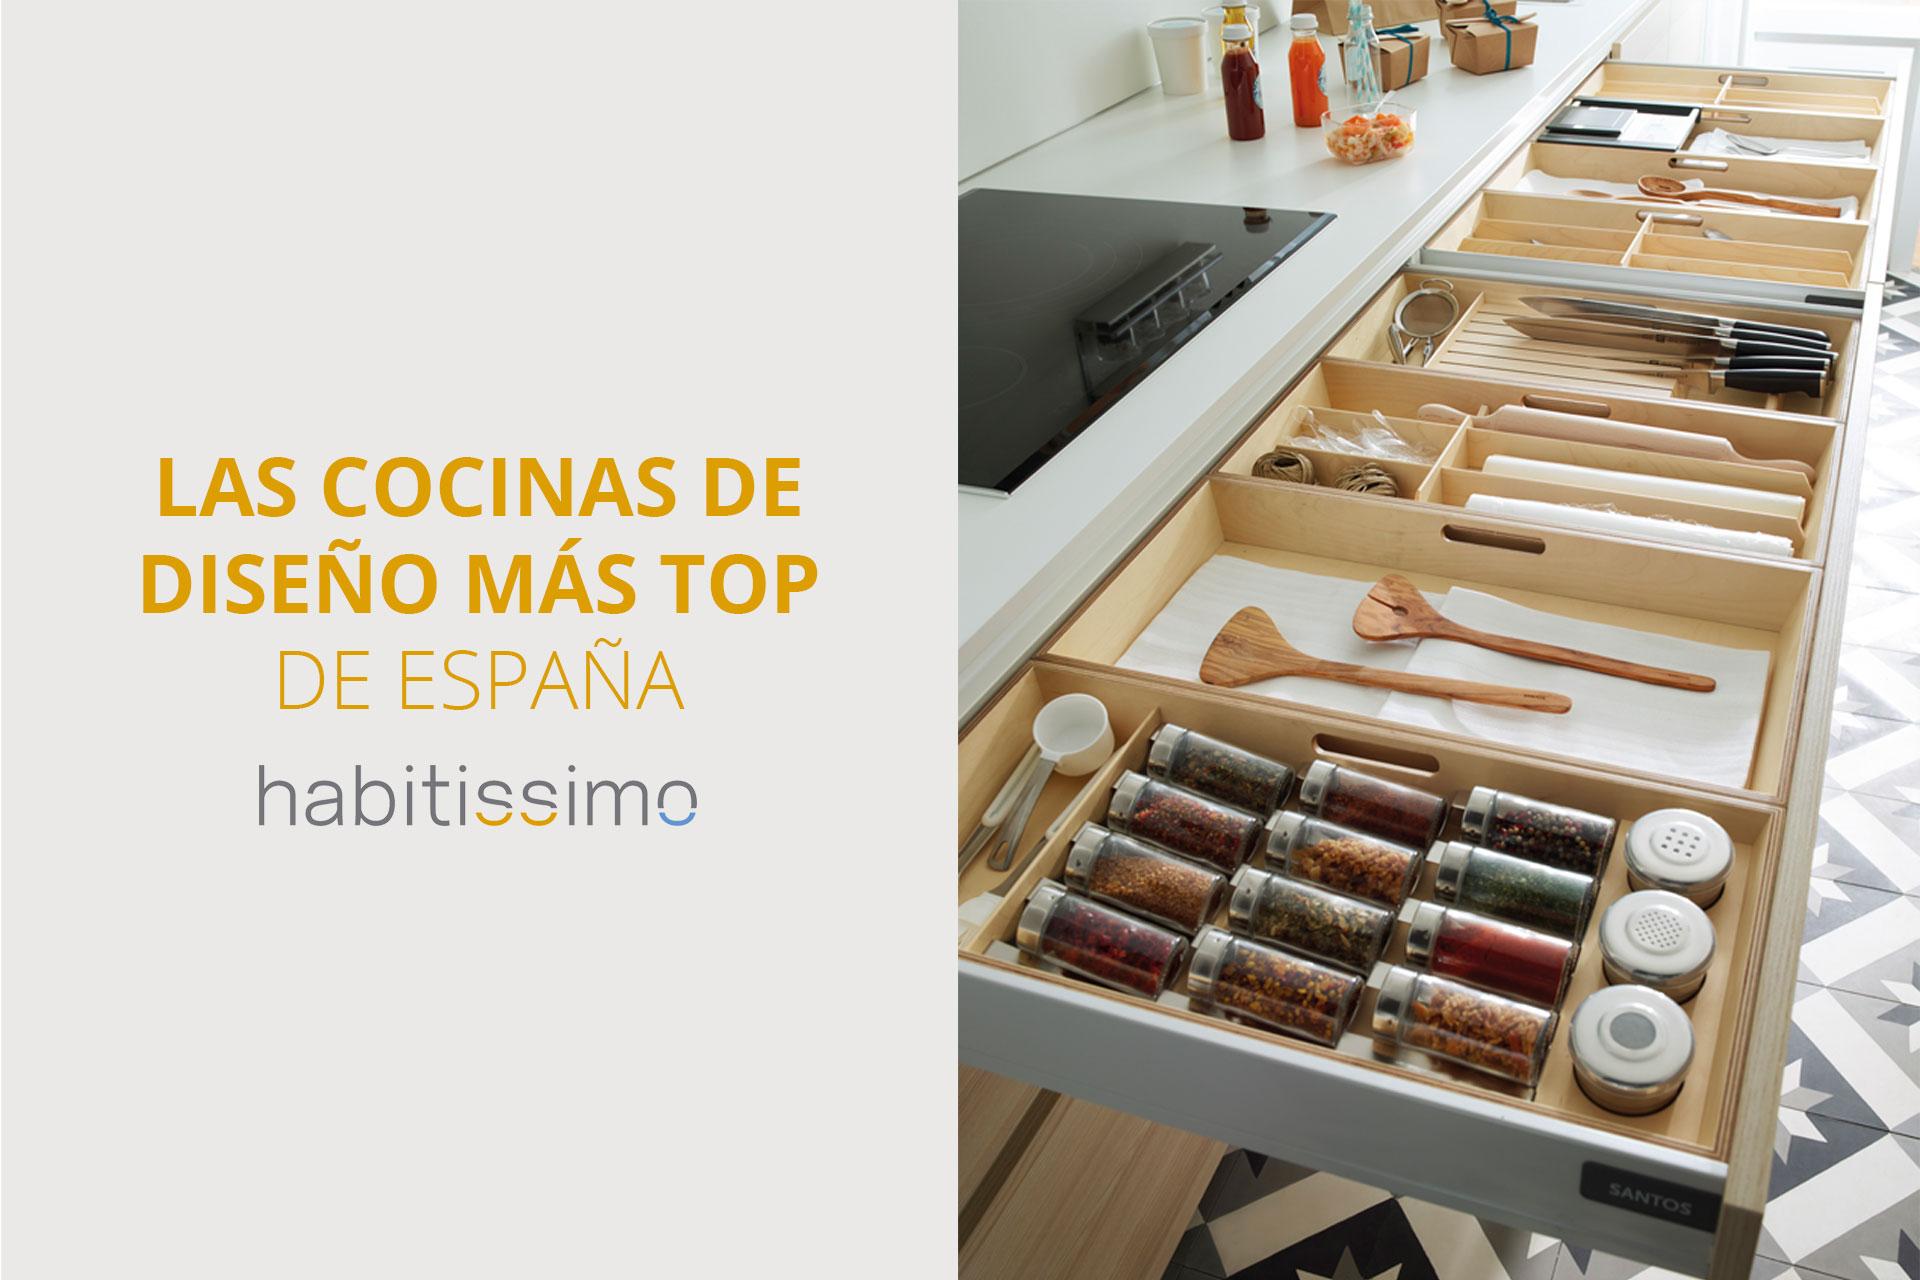 Cocinas Top de España: ranking de Habitissimo   Cocinas Santos   Santiago Interiores